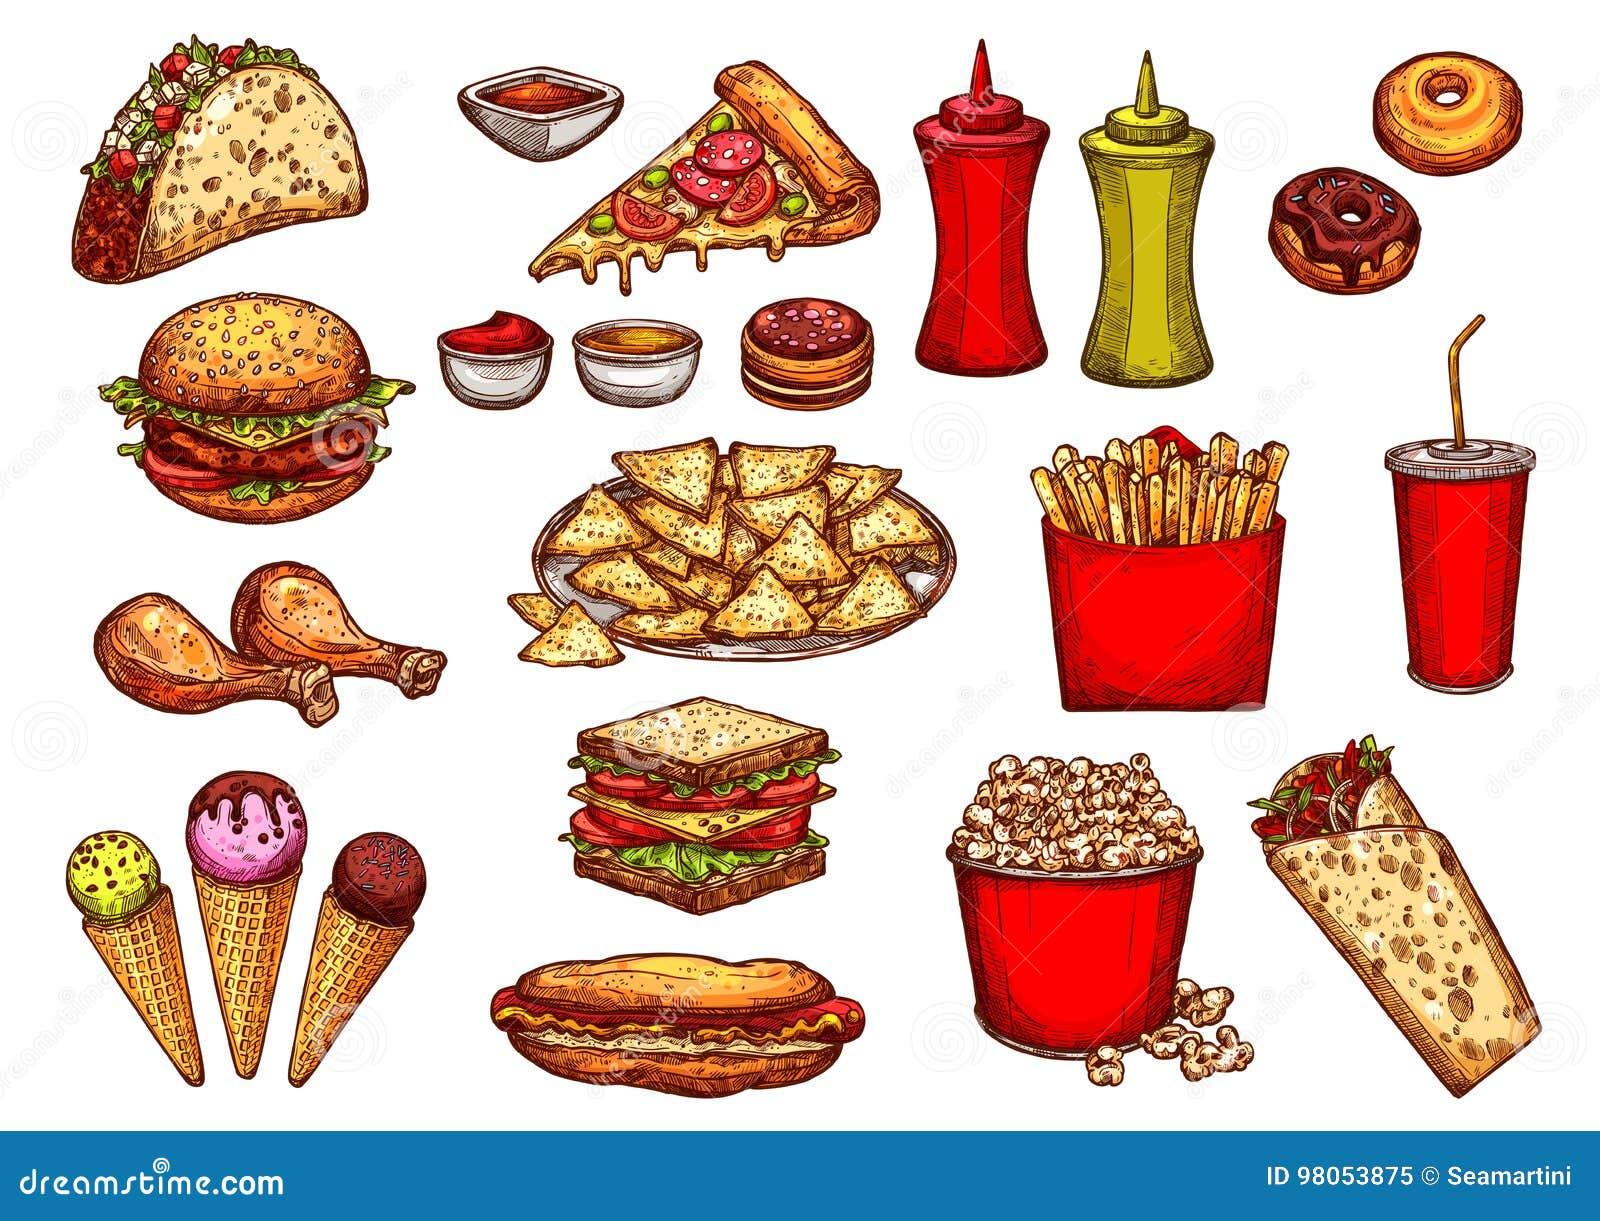 Fast Food Burger Drink And Dessert Sketch Set Stock Vector